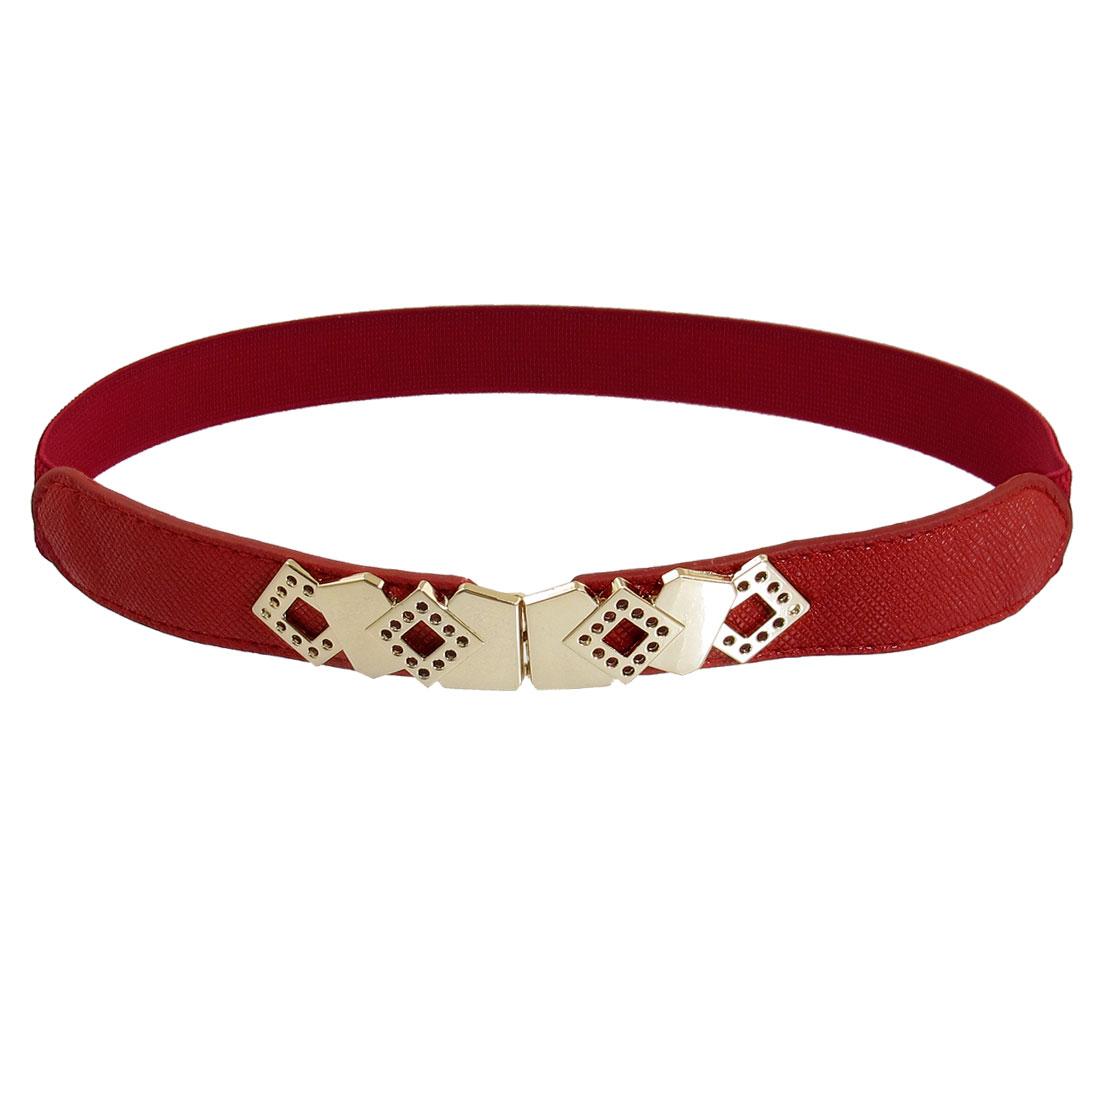 Hollow Out Rhombus Interlock Buckle Textured Elastic Cinch Belt Red for Ladies